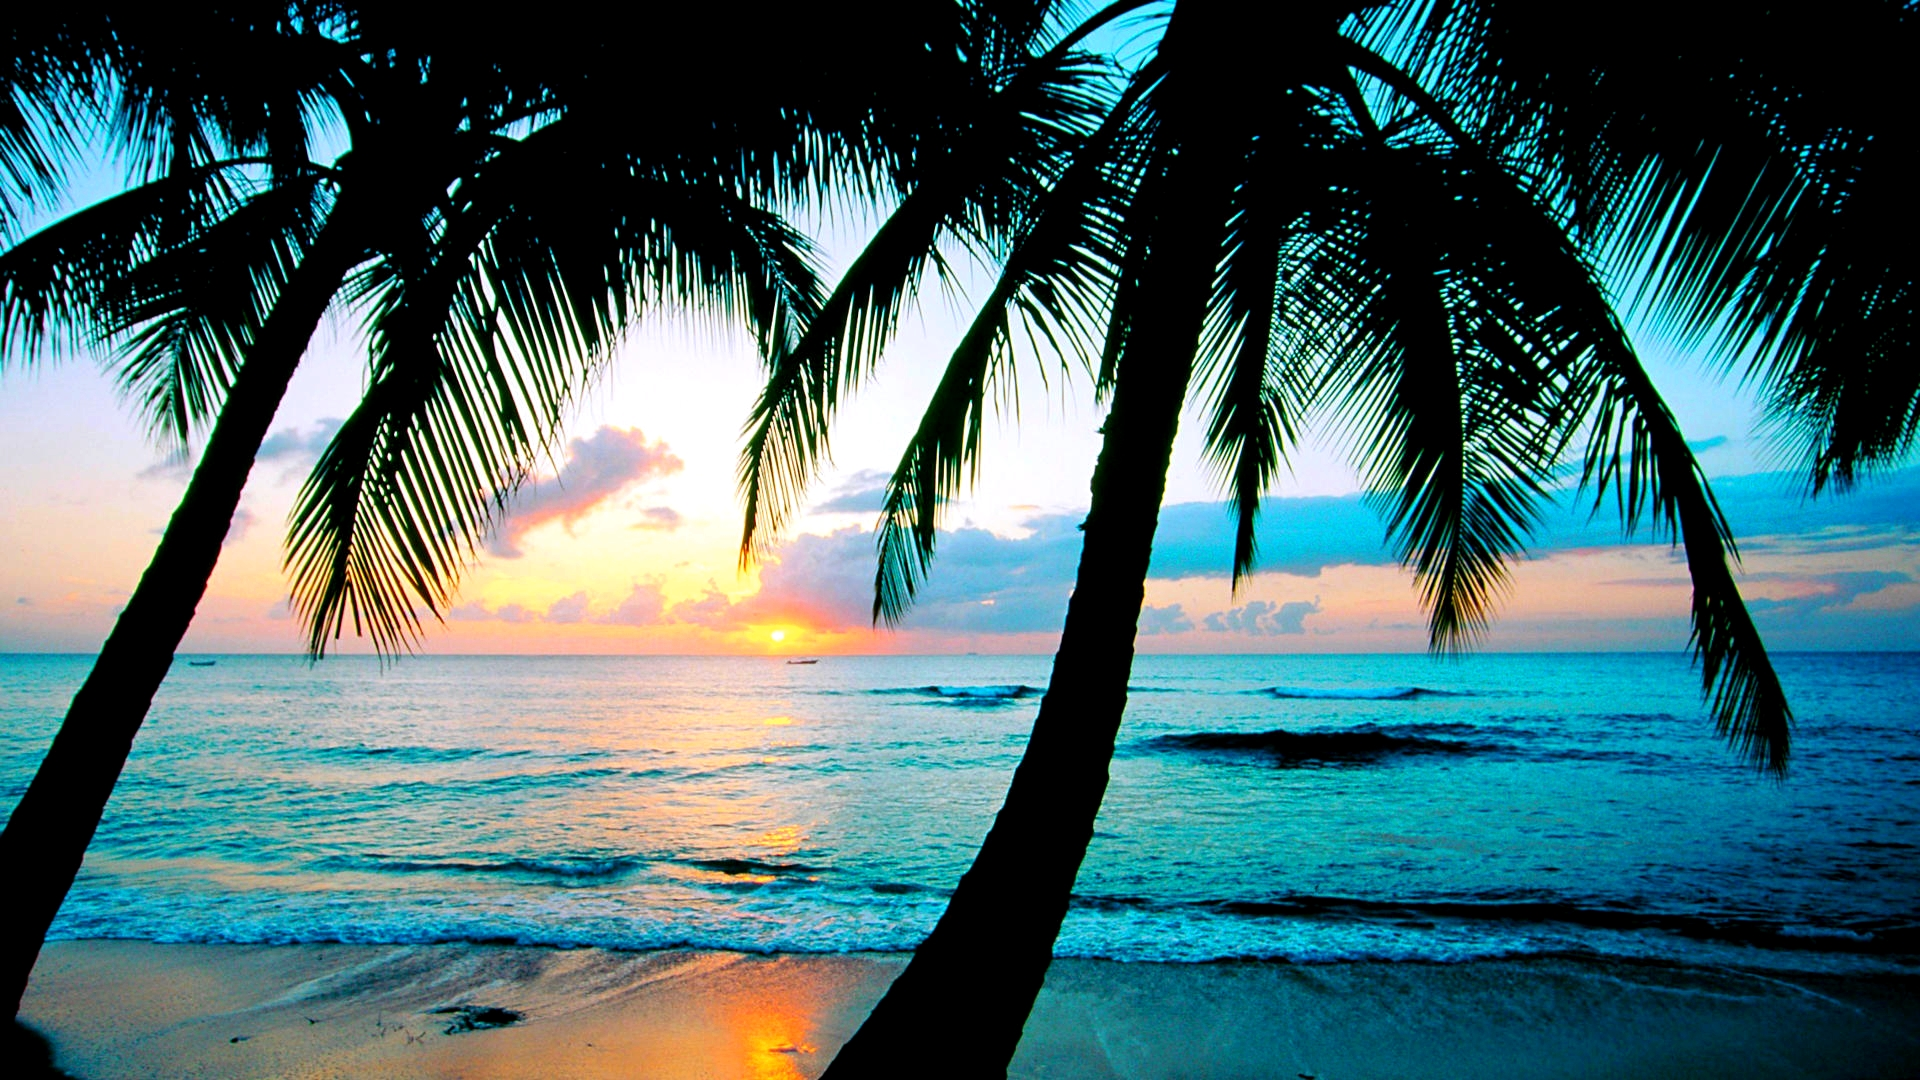 beach desktop wallpapers download Desktop Backgrounds for HD 1920x1080